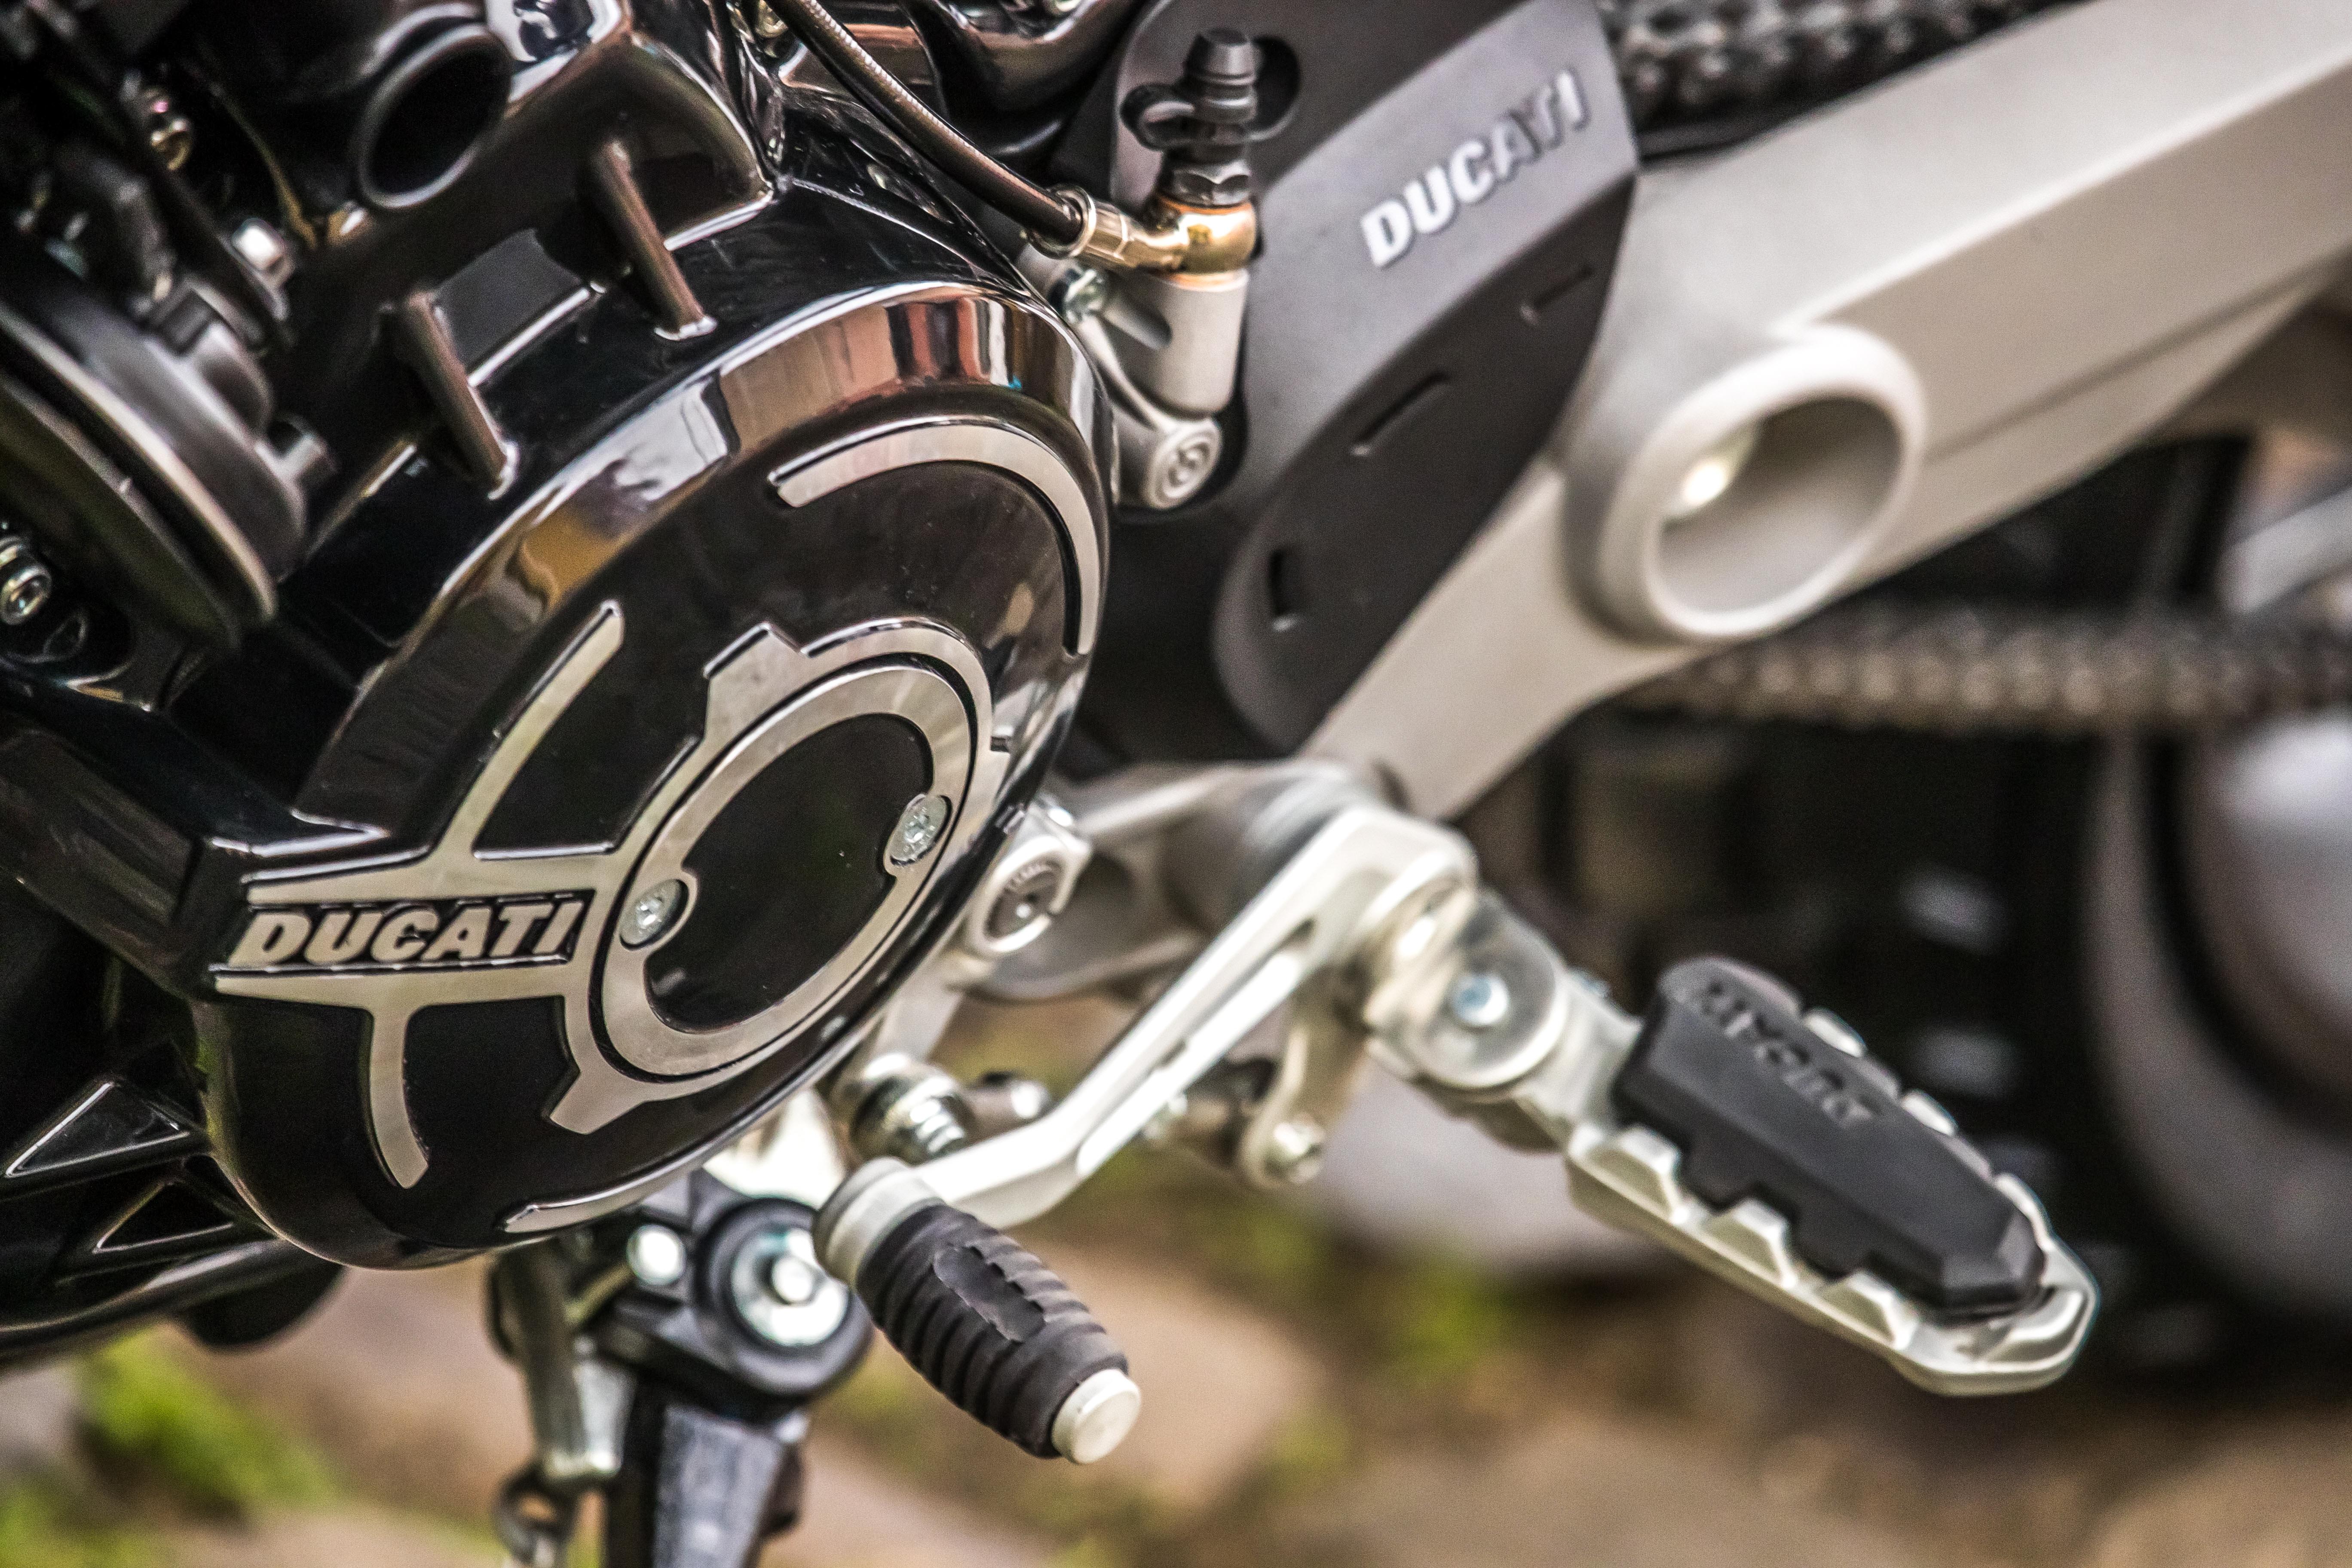 Scrambler_Ducati_1100small_Special_Static_058